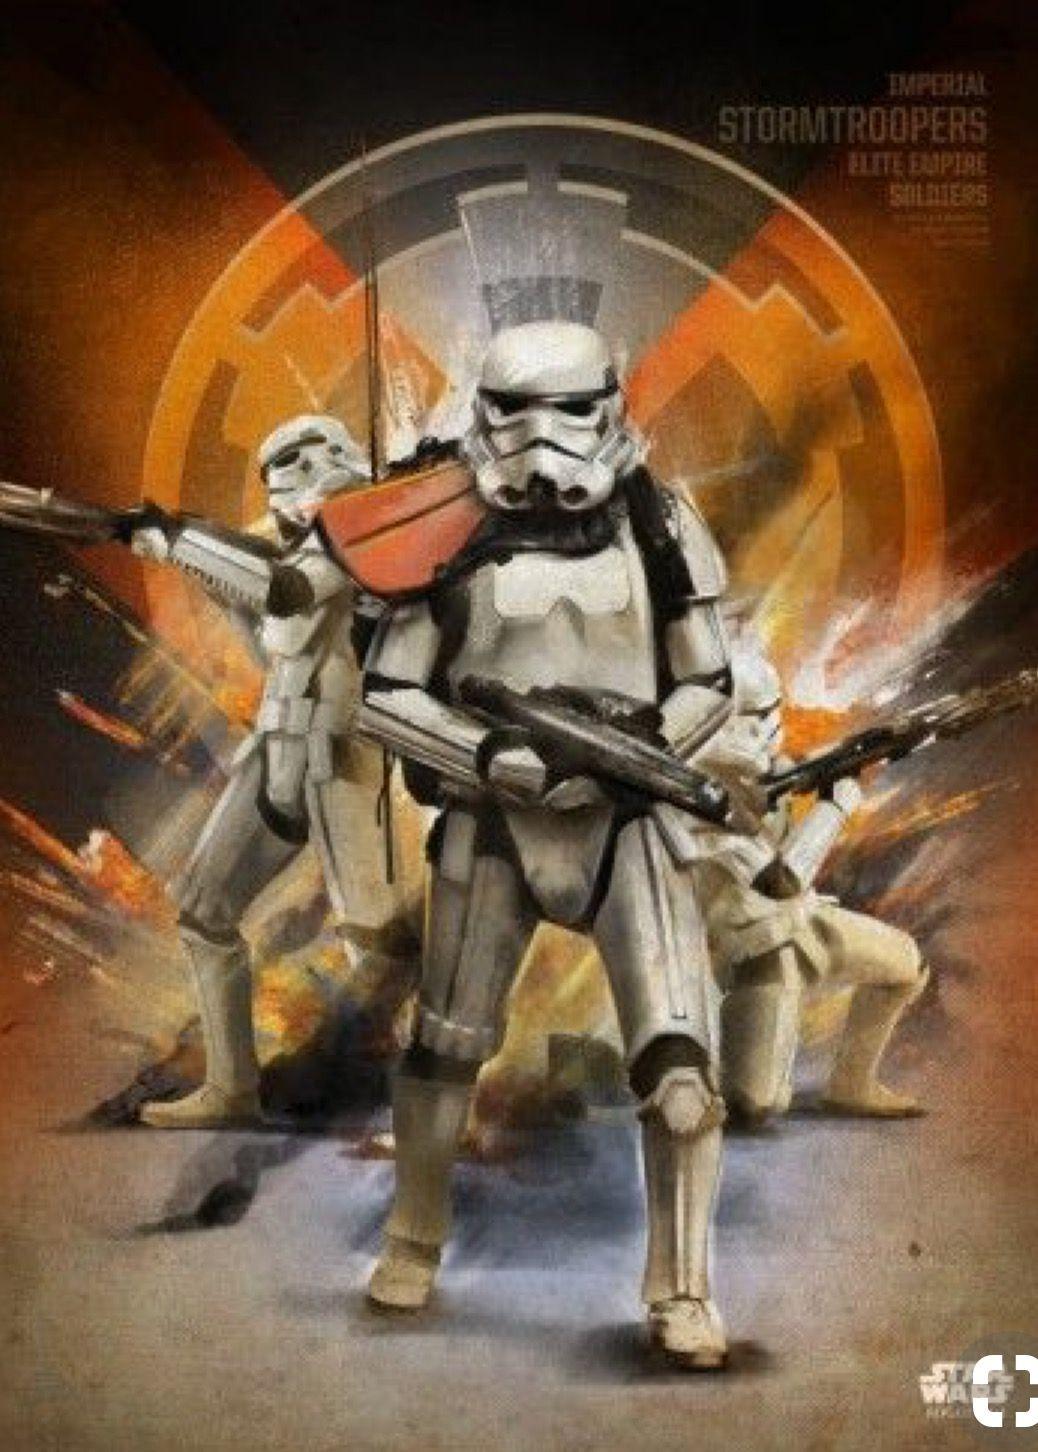 Star Wars Stormtrooper Original Art Print signed by artist Scott Harben